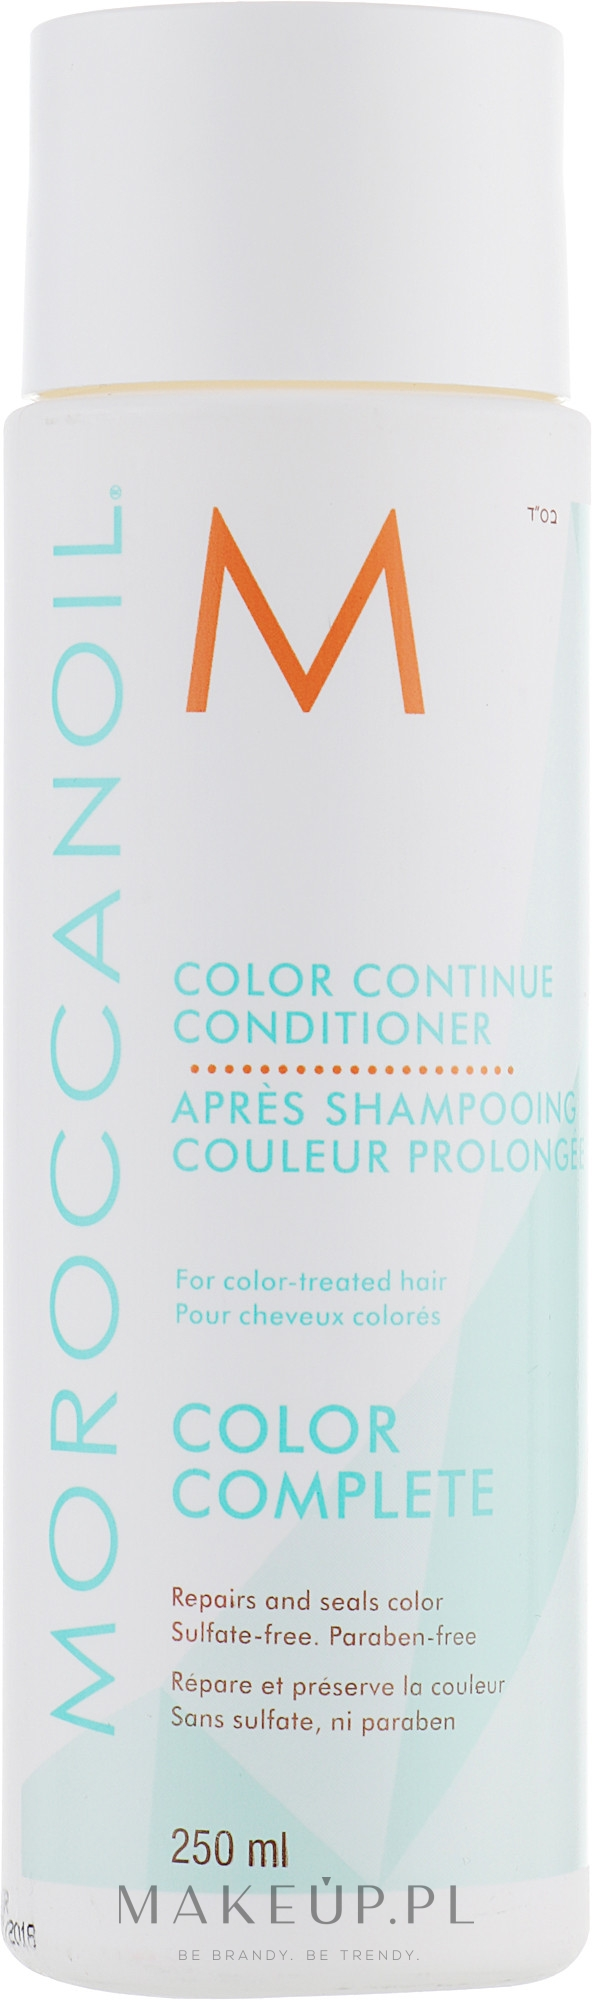 Odżywka do włosów - Moroccanoil Color Continue Conditioner — фото 250 ml